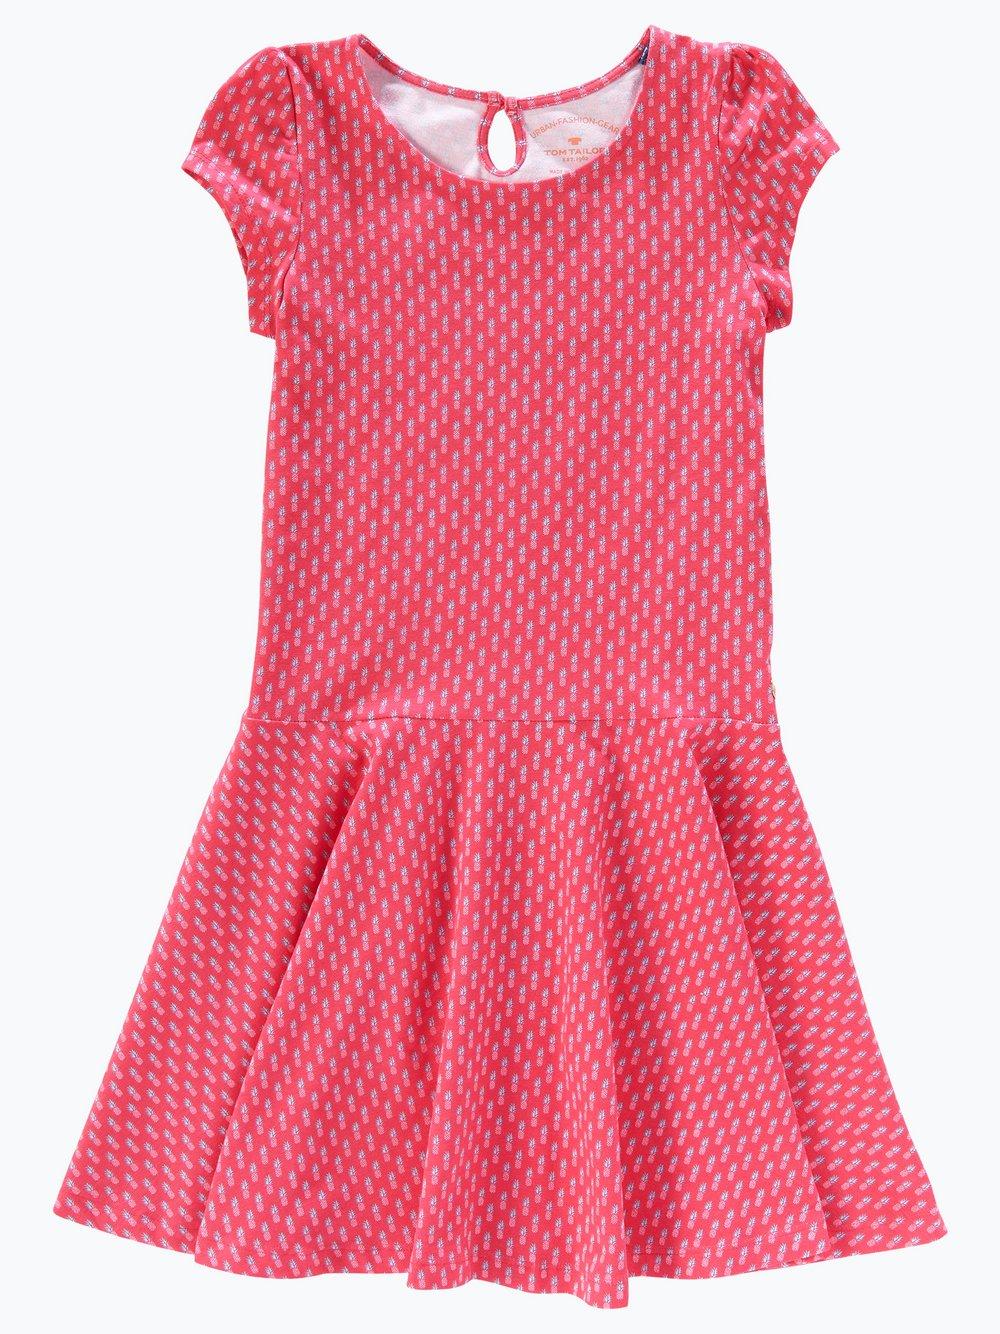 Kleid tom tailor madchen